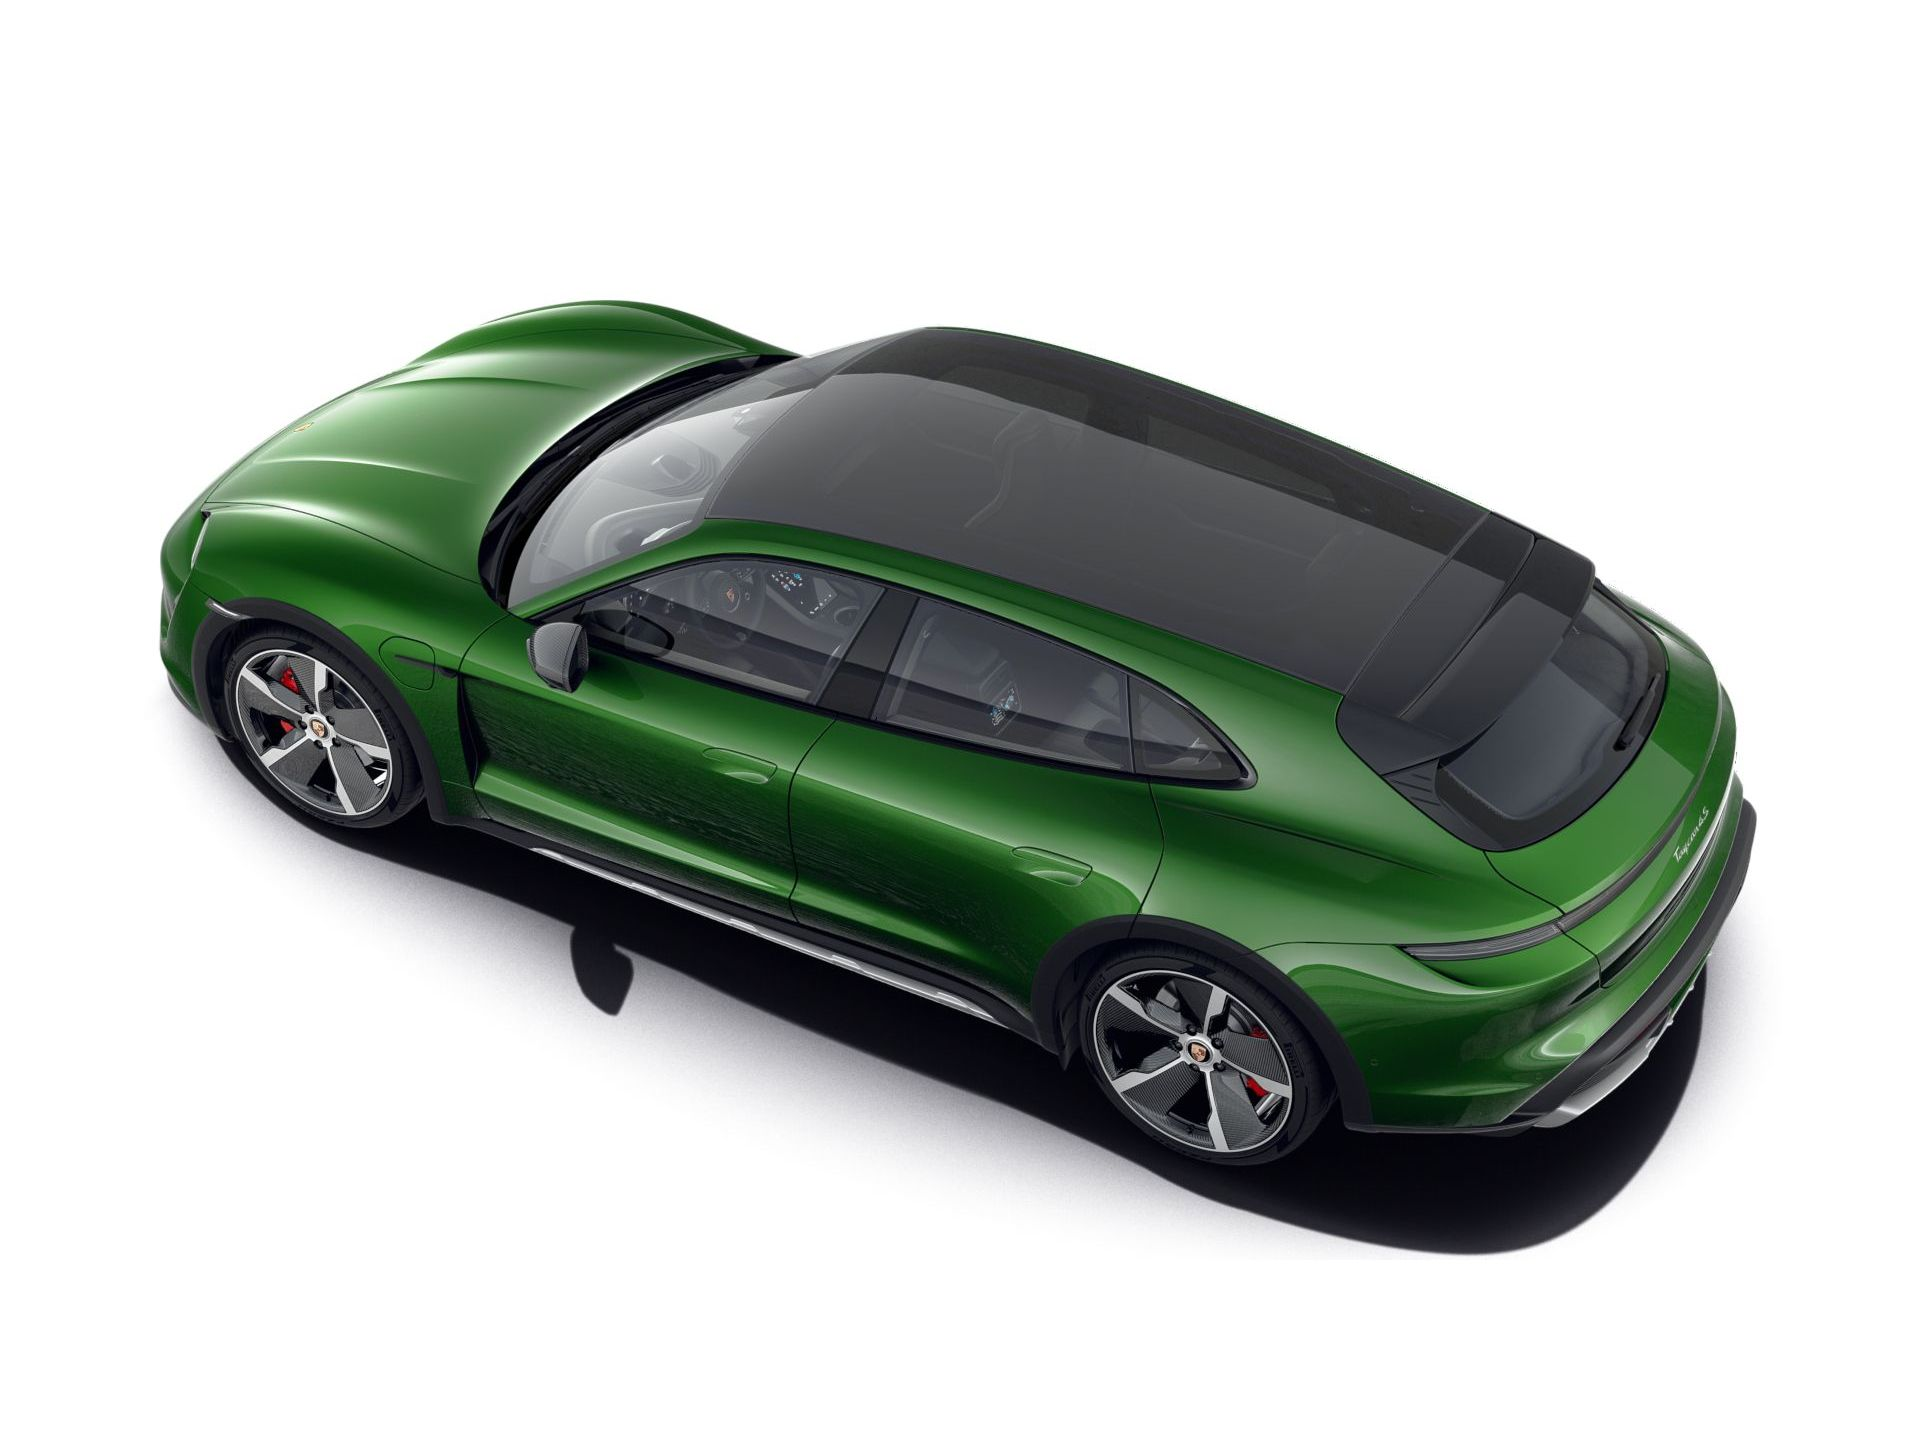 2021 Porsche Taycan 4S Cross Turismo – 4